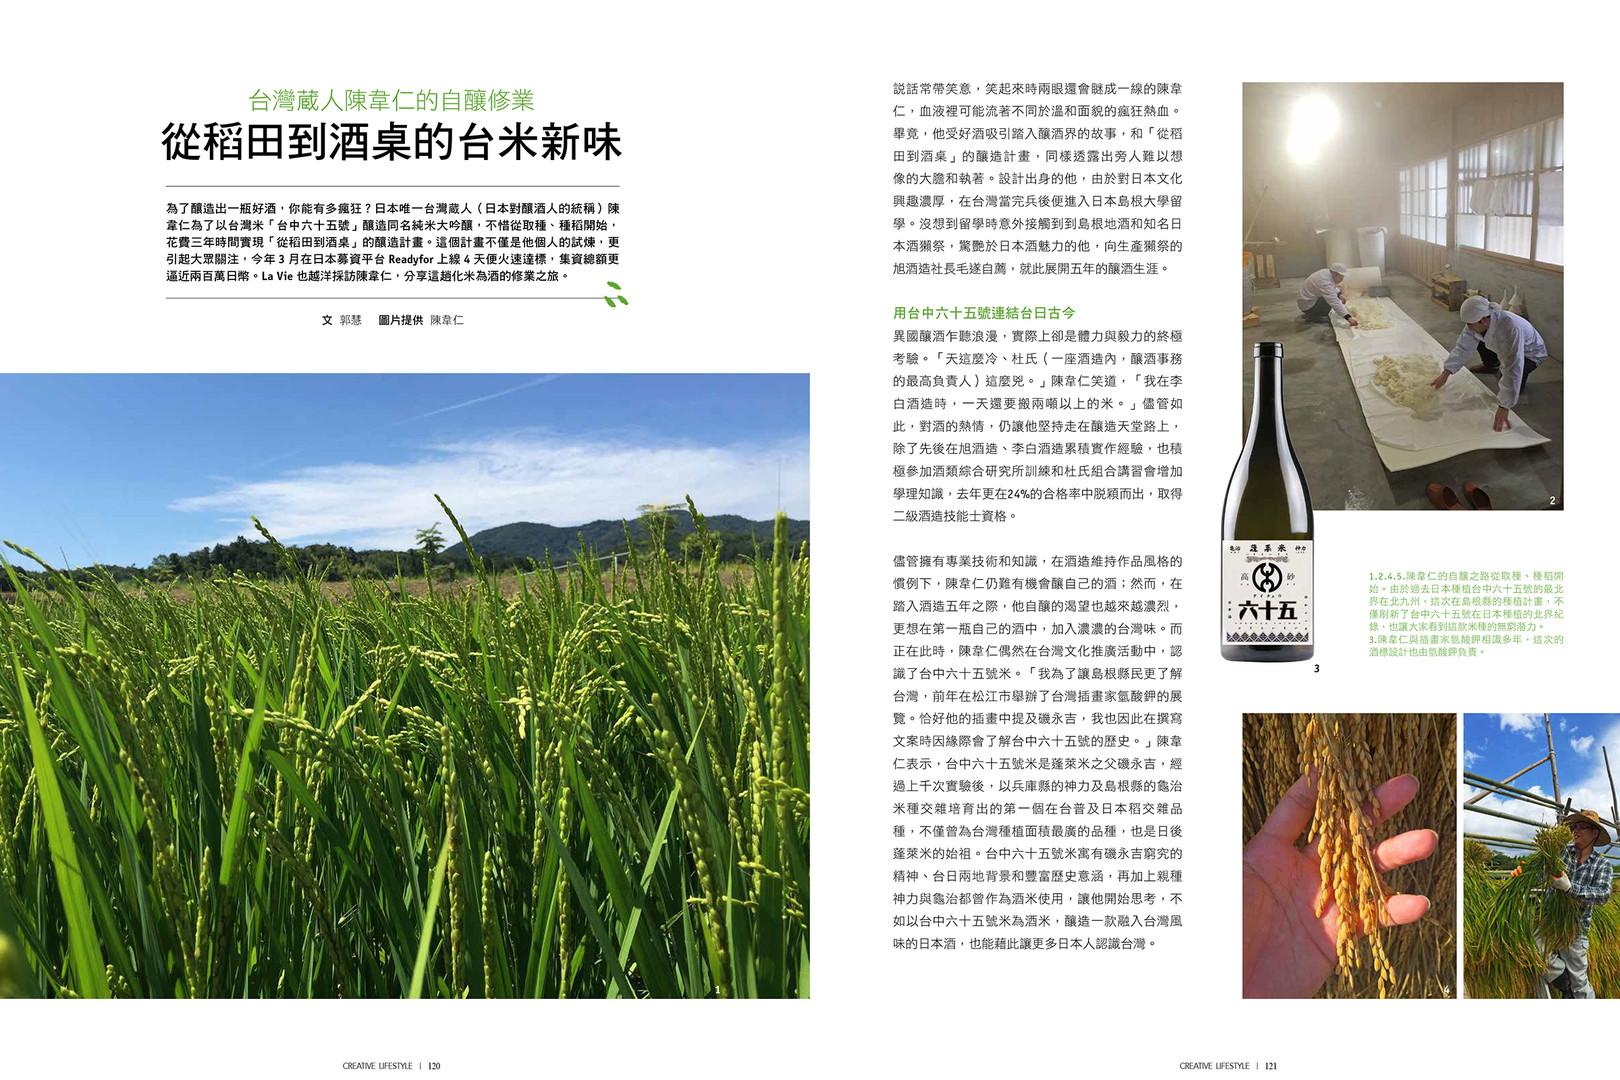 Creative-Lifestyle169-從稻田到酒桌的台米新味 -1.jpg